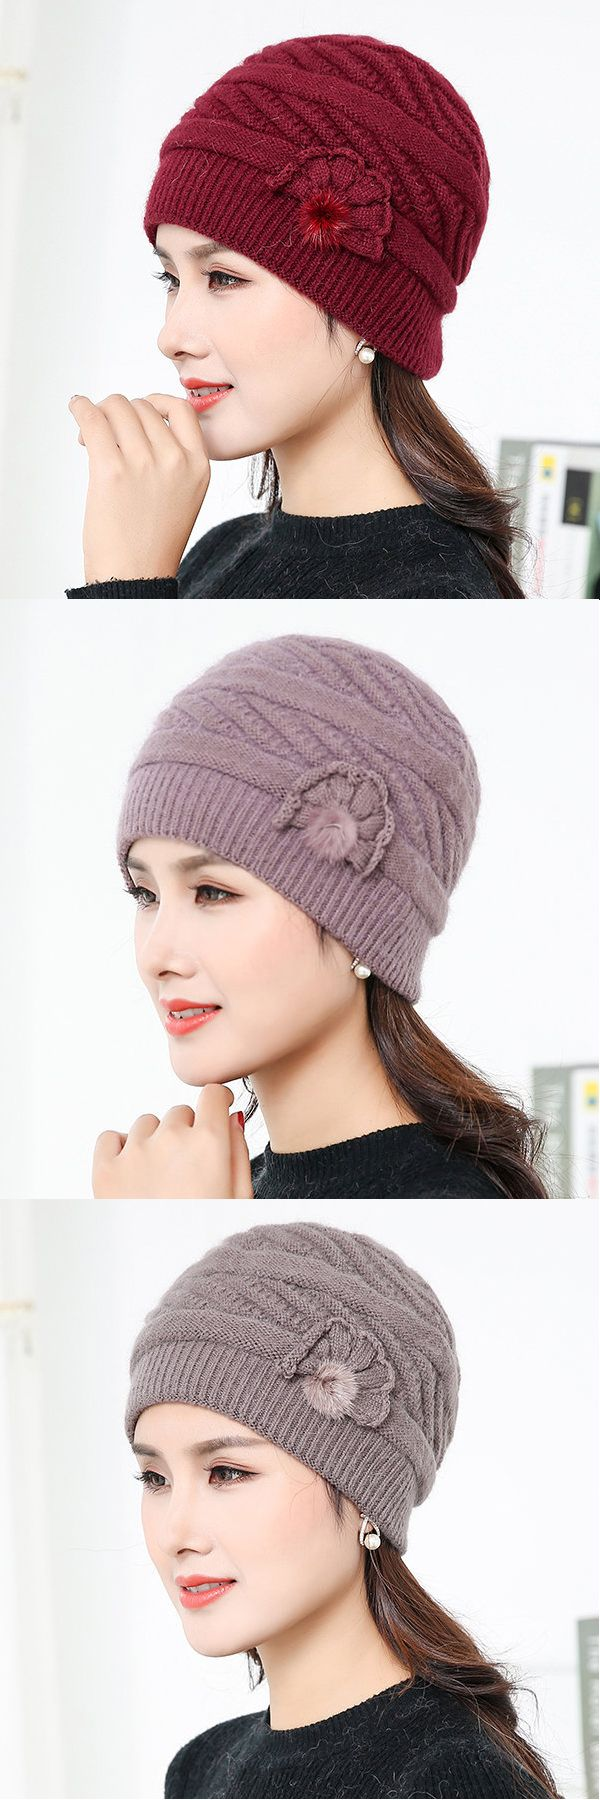 Women Elegant Knitted Rabbit Fur Hats Winter Thicken Double Layer Casual Blend Beanies Cap